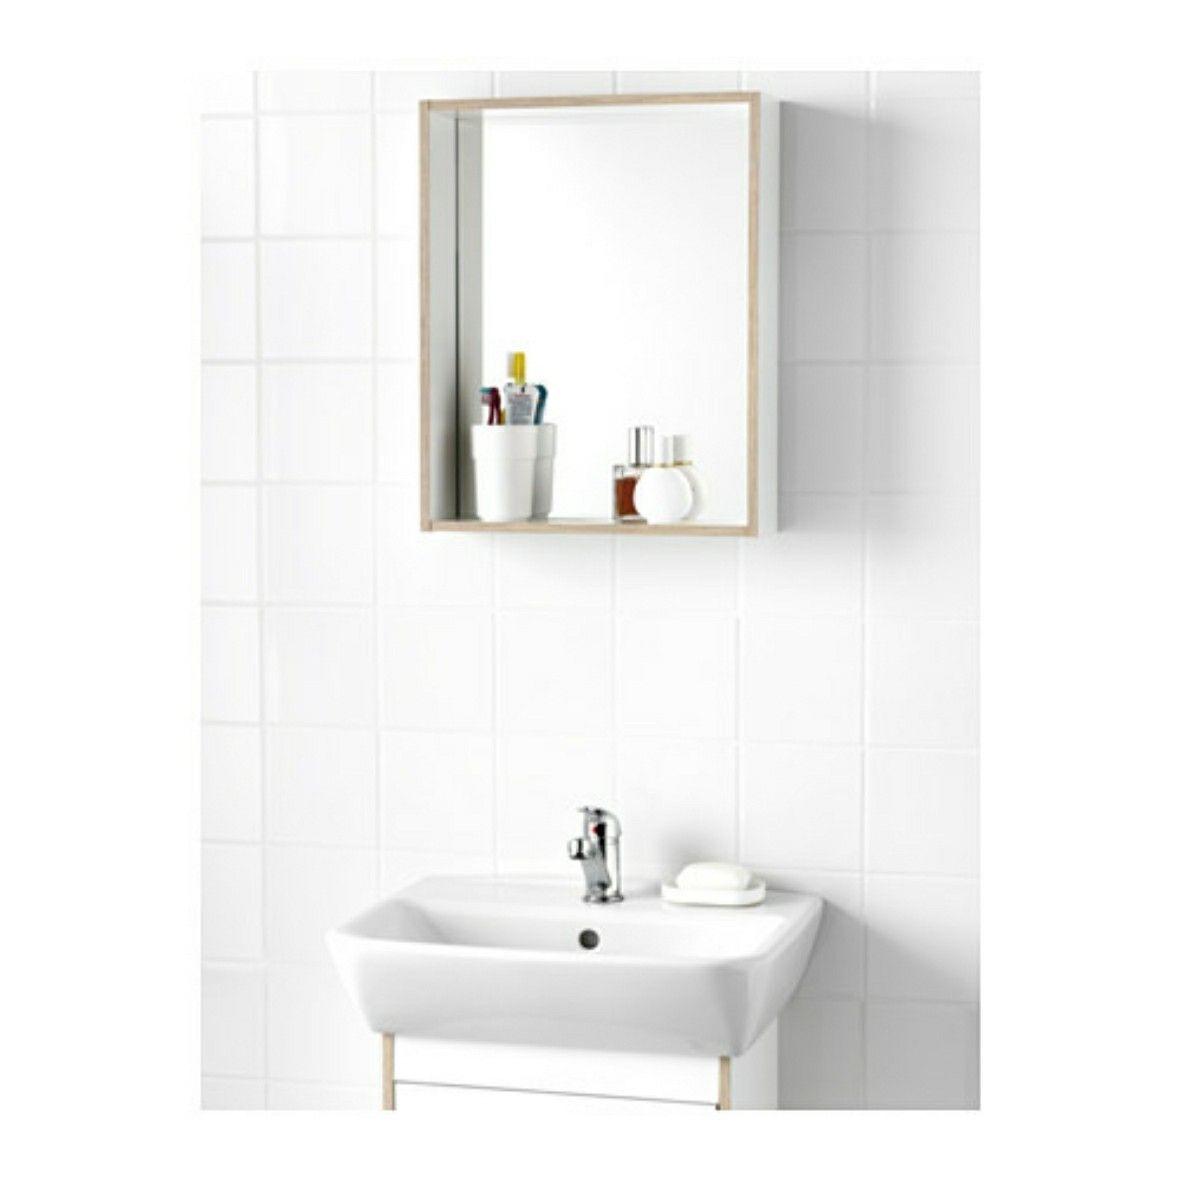 Pin by Yi LI on Deco 2017FW Mirror with shelf, Ikea